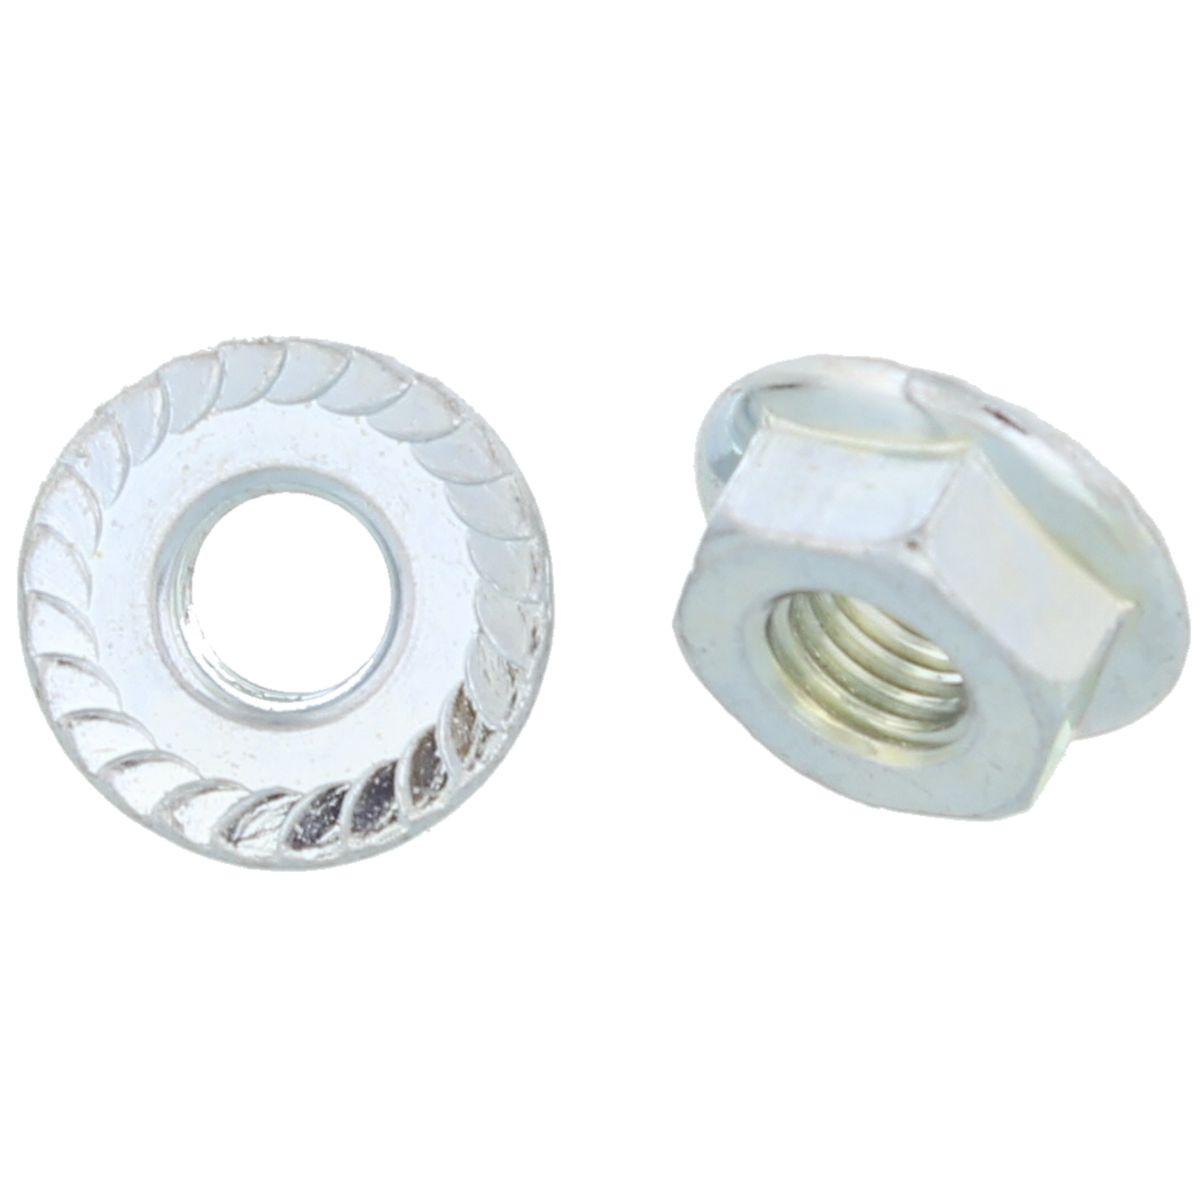 #10-32 Serrated Flange Lock Nuts — ASME B18.16.4, Zinc, Fine, 100/PKG